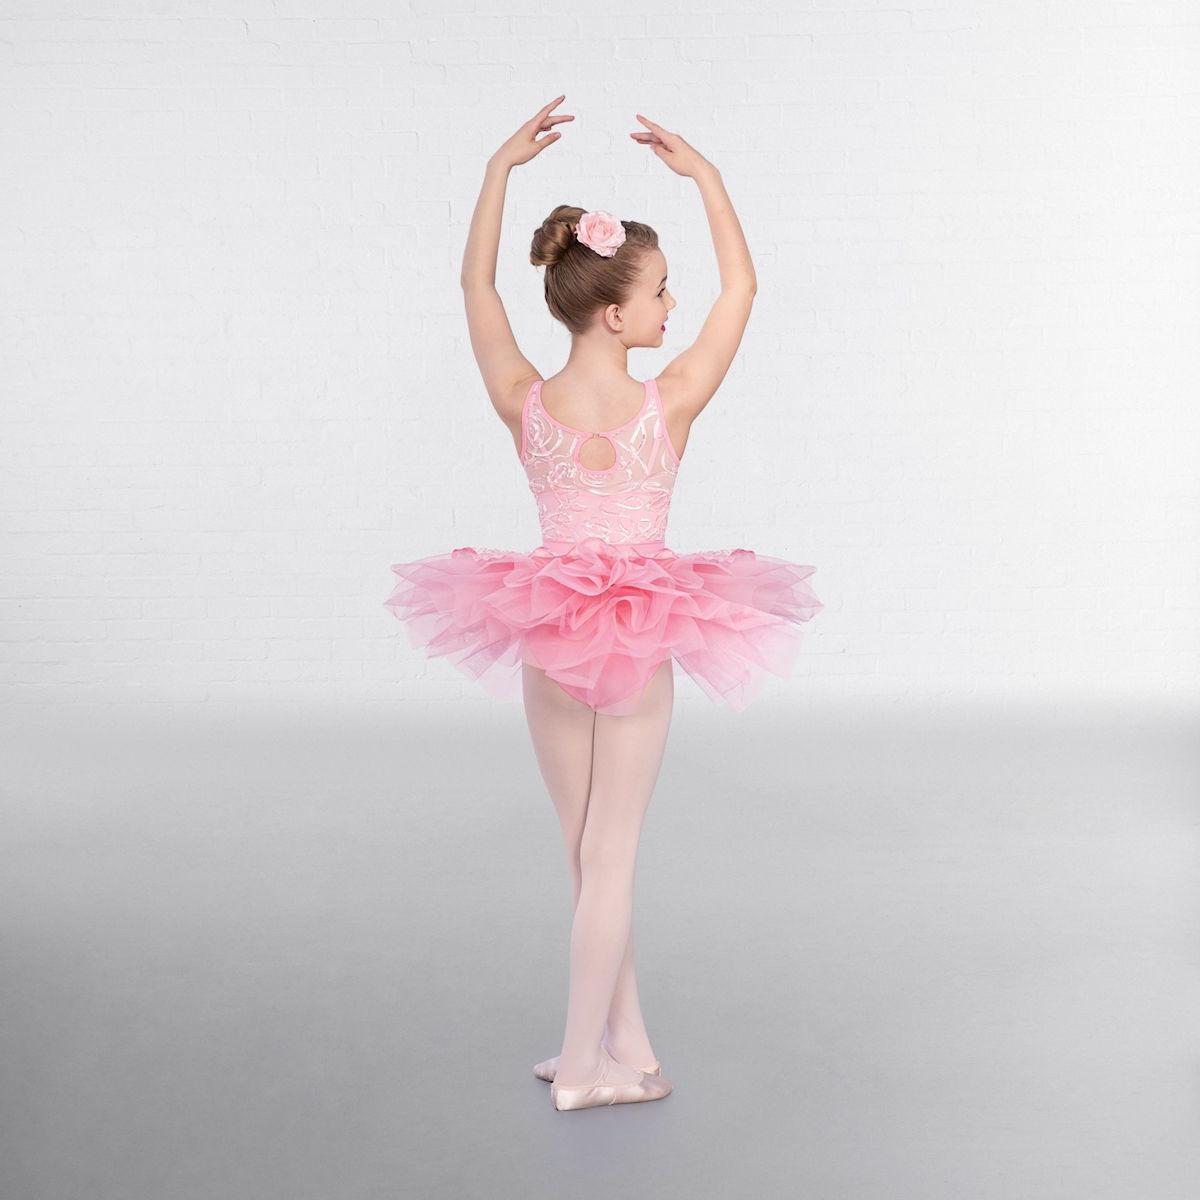 1st Position Pink Ballet Dance Tutu Skirt